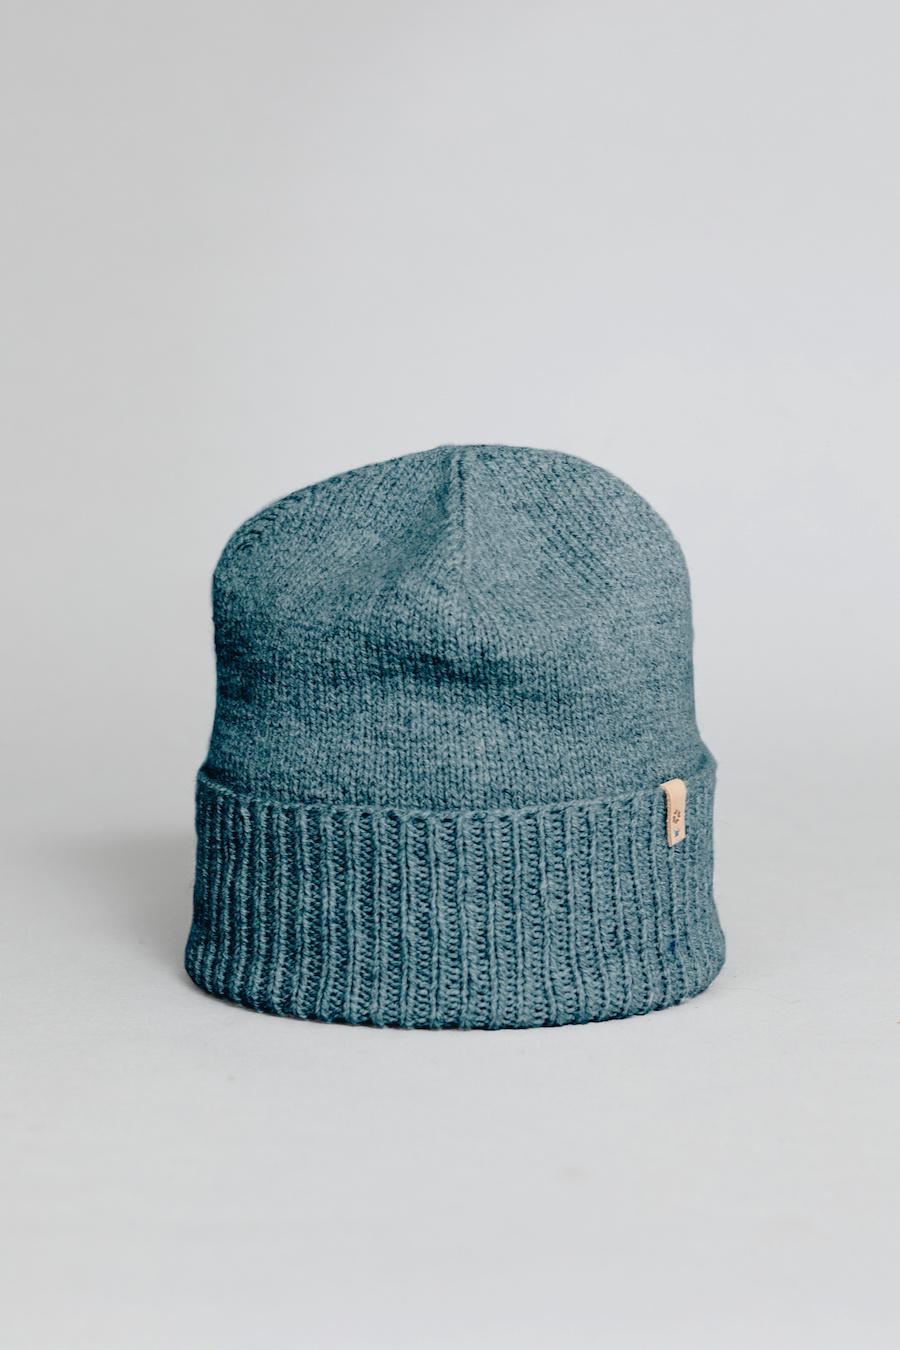 Dinadi Merino Cuffed Hat